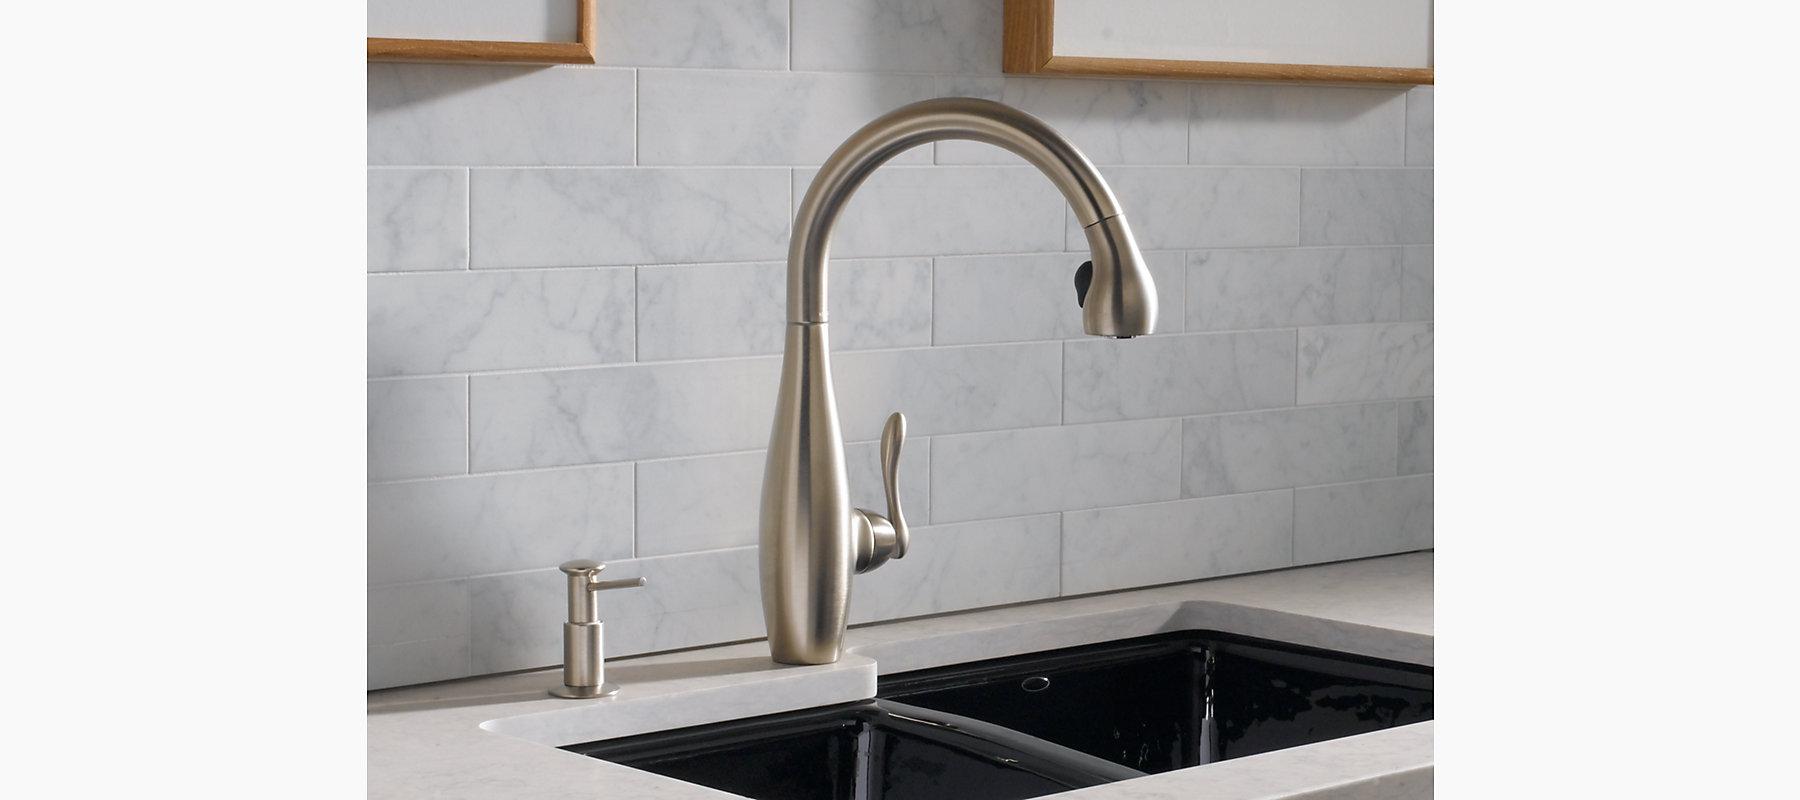 Clairette SingleHandle Spray Kitchen Sink Faucet K KOHLER - Discontinued kohler bathroom sink faucets